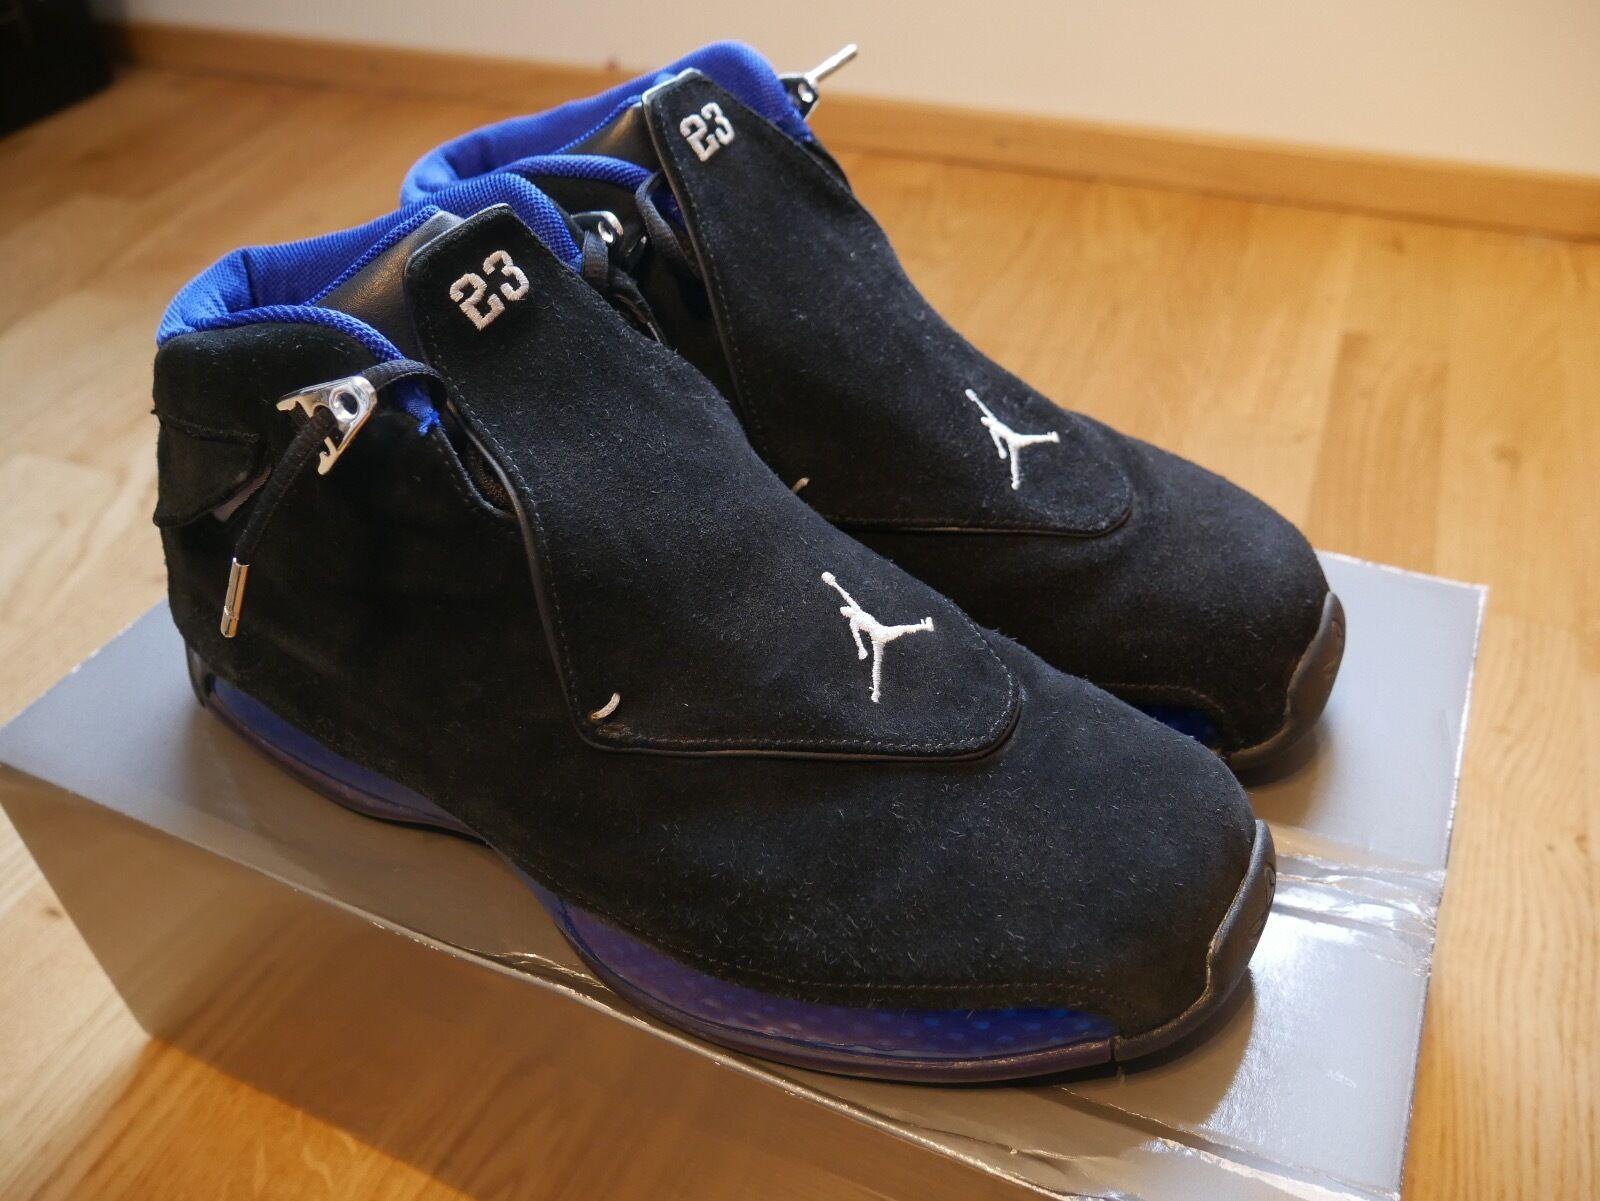 Nike Air Jordan 18 (XVIII) - OG - 47,5 US 13 (XI, IV, Yeezy, Boost, Concord)